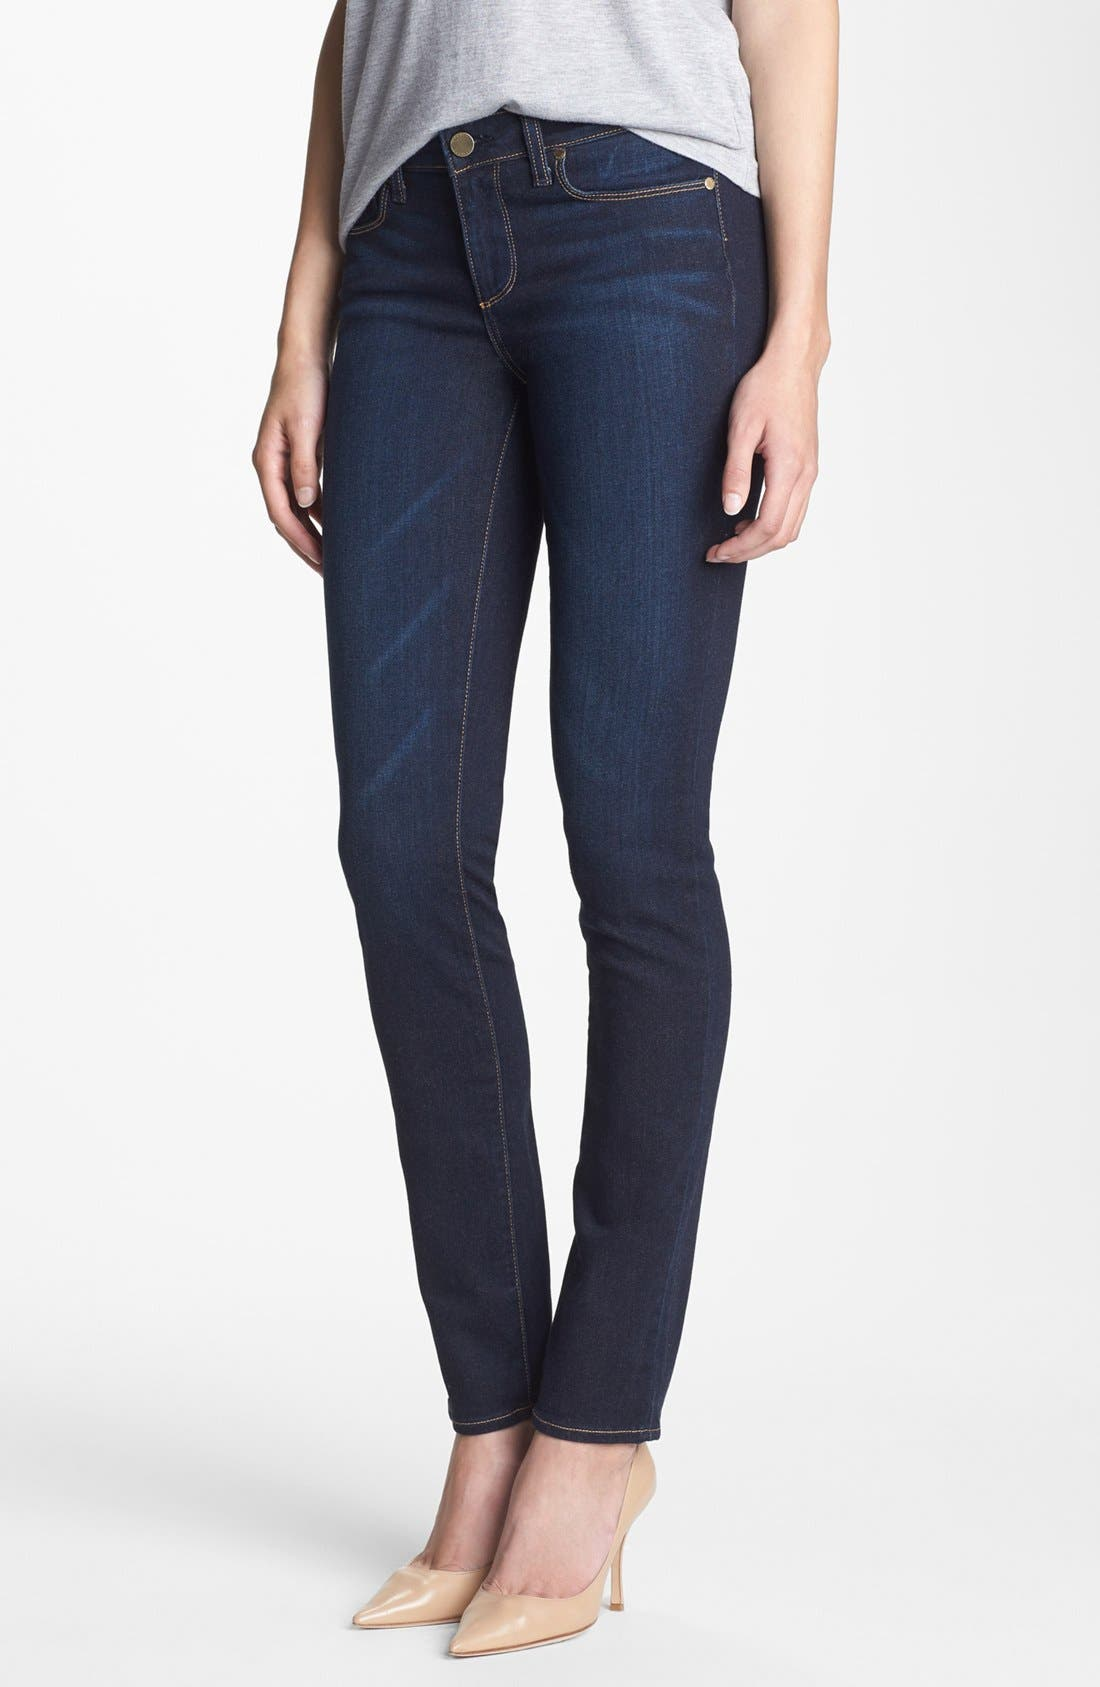 Alternate Image 1 Selected - Paige Denim 'Skyline' Skinny Jeans (Surface)